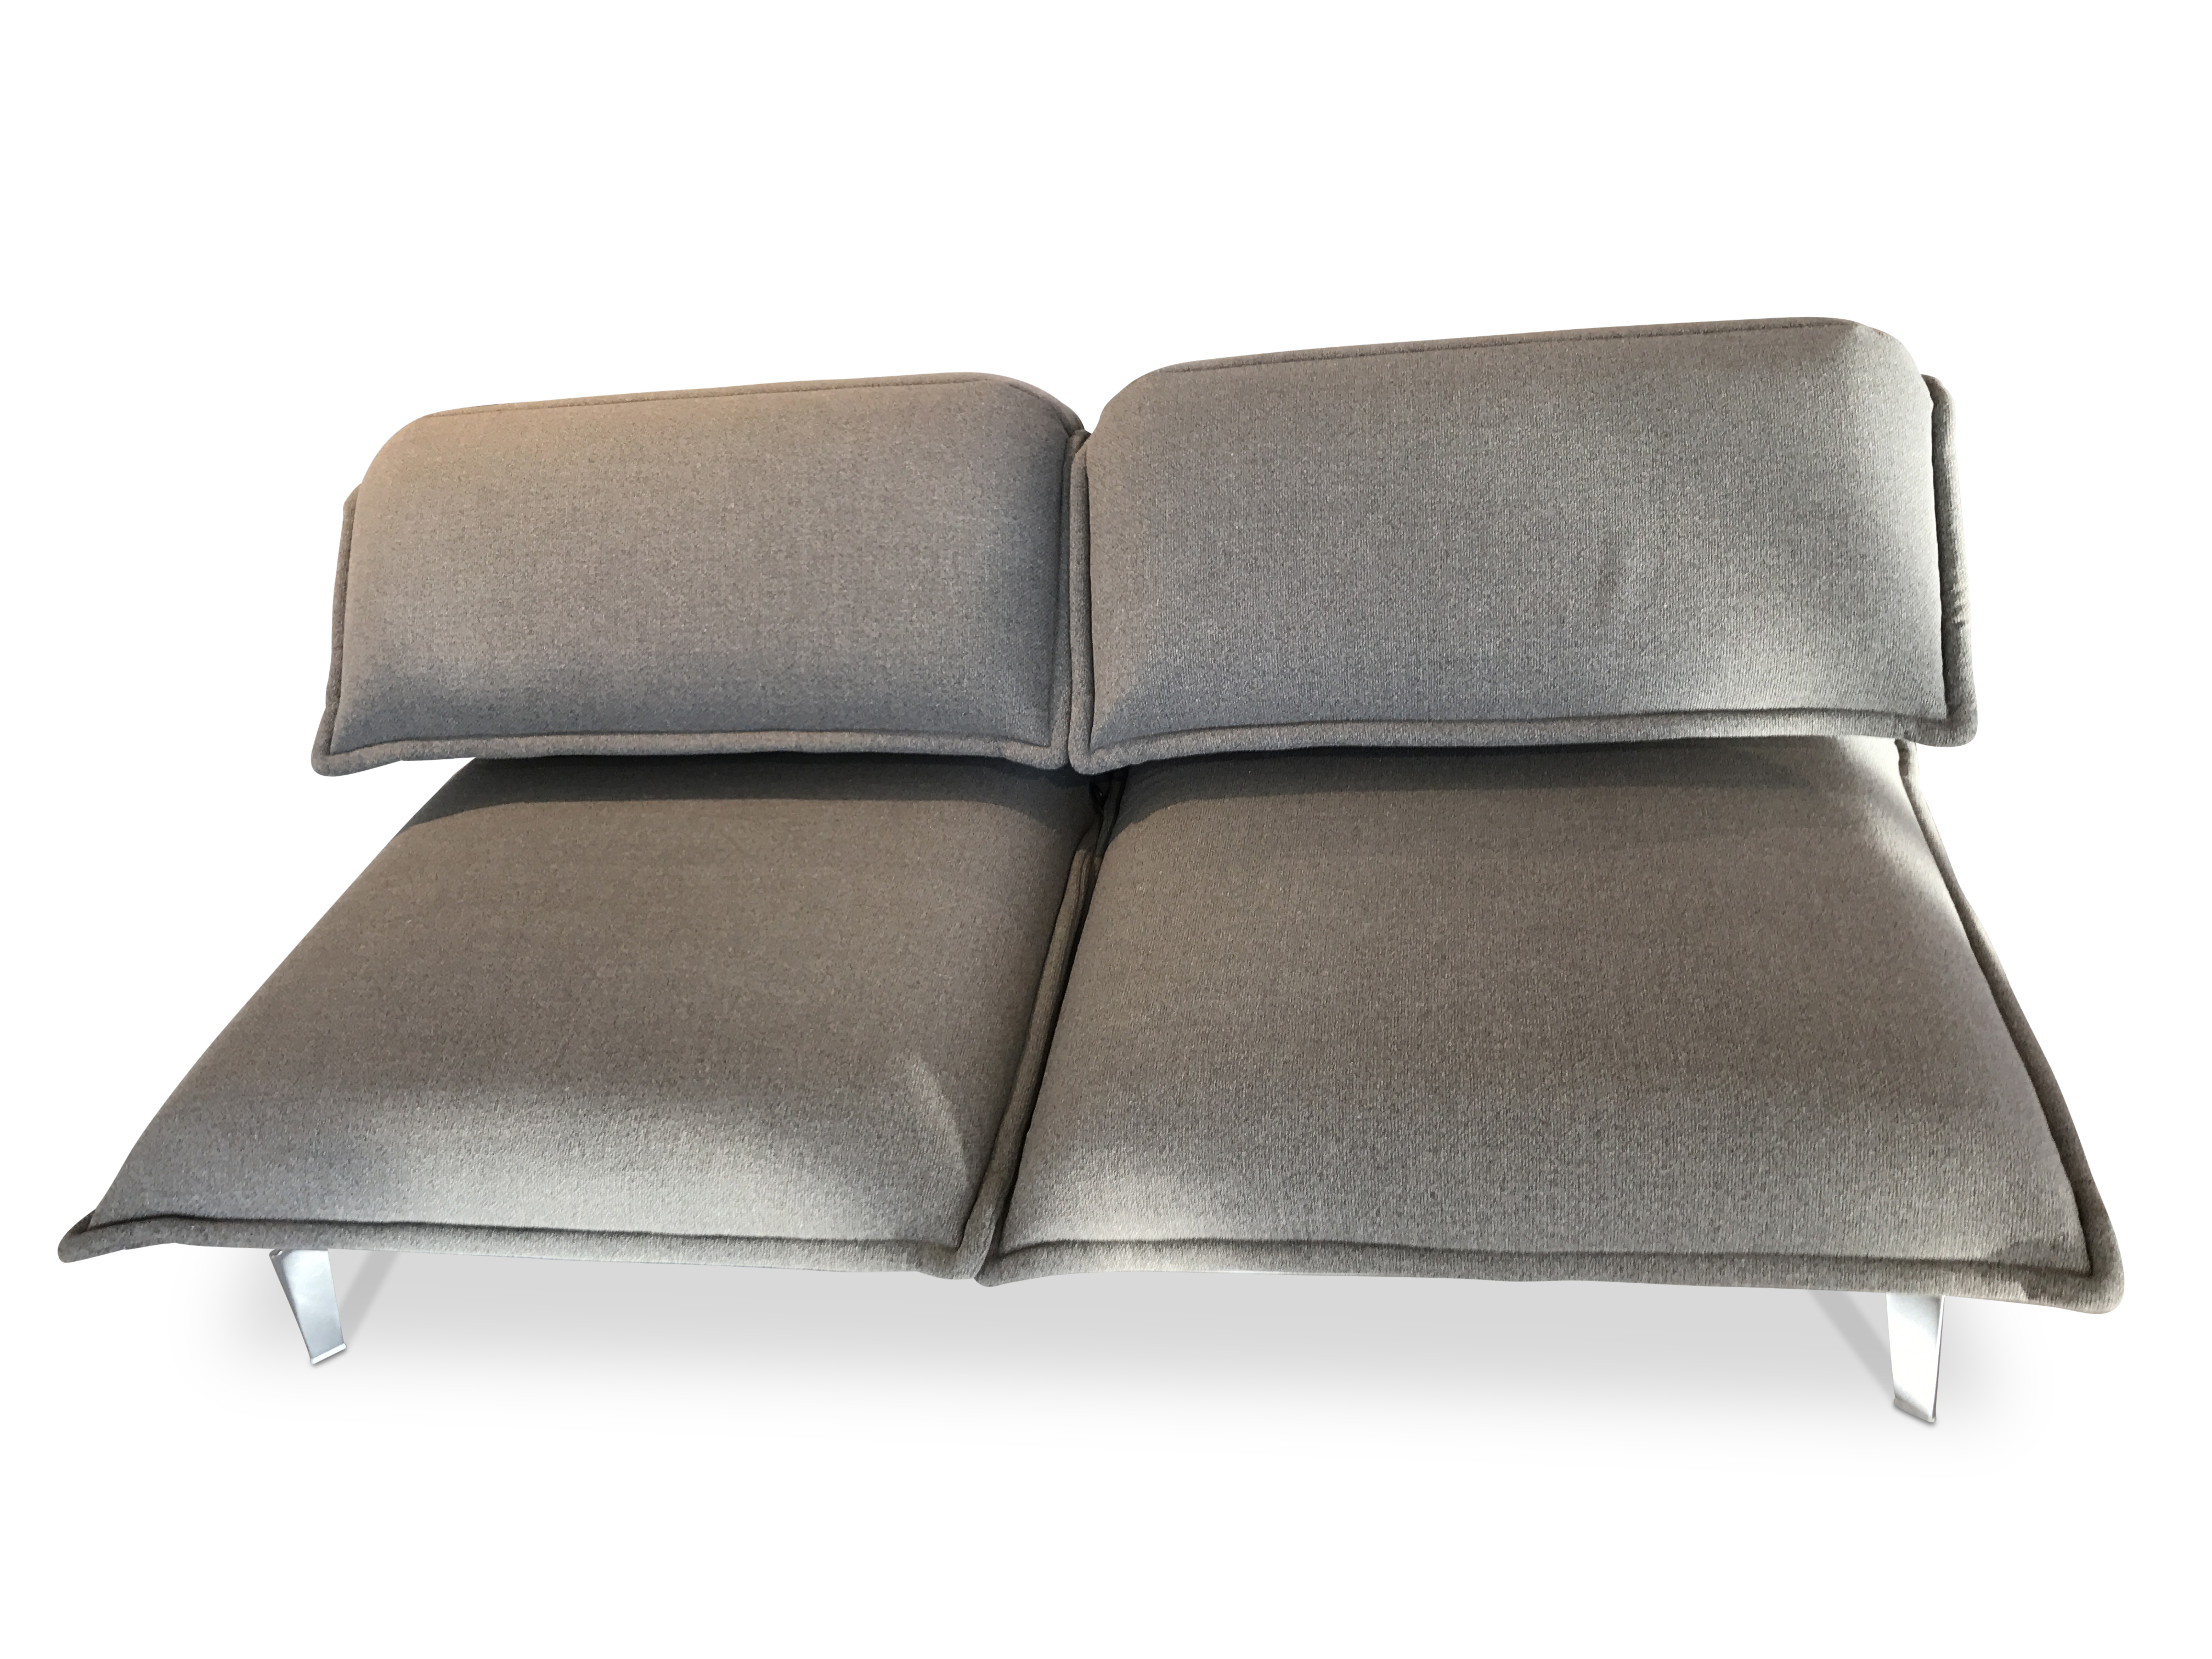 2 sitzer sofas sofas m belfirst. Black Bedroom Furniture Sets. Home Design Ideas